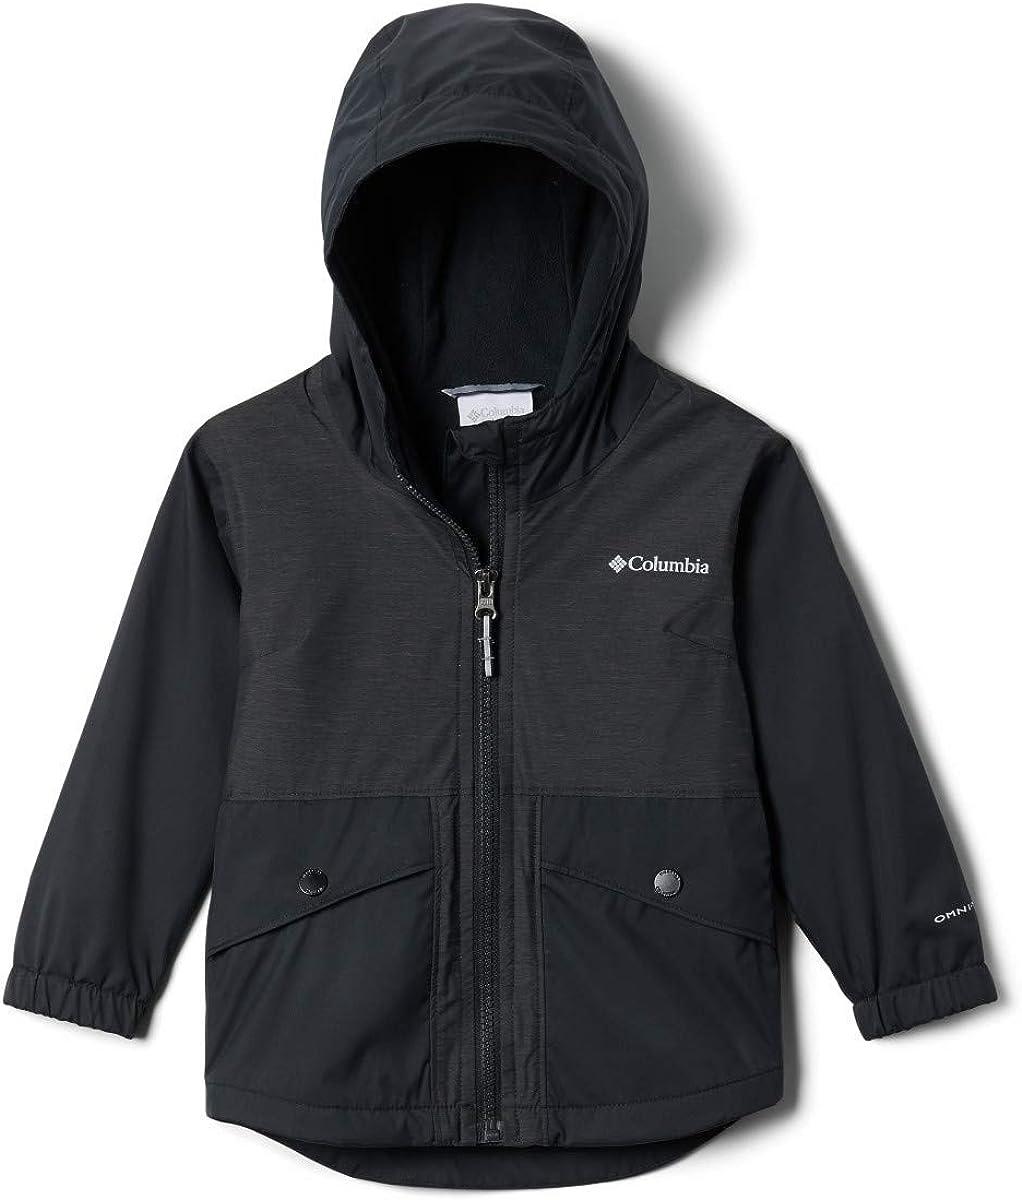 Rainy Trails Fleece Lined Jacket